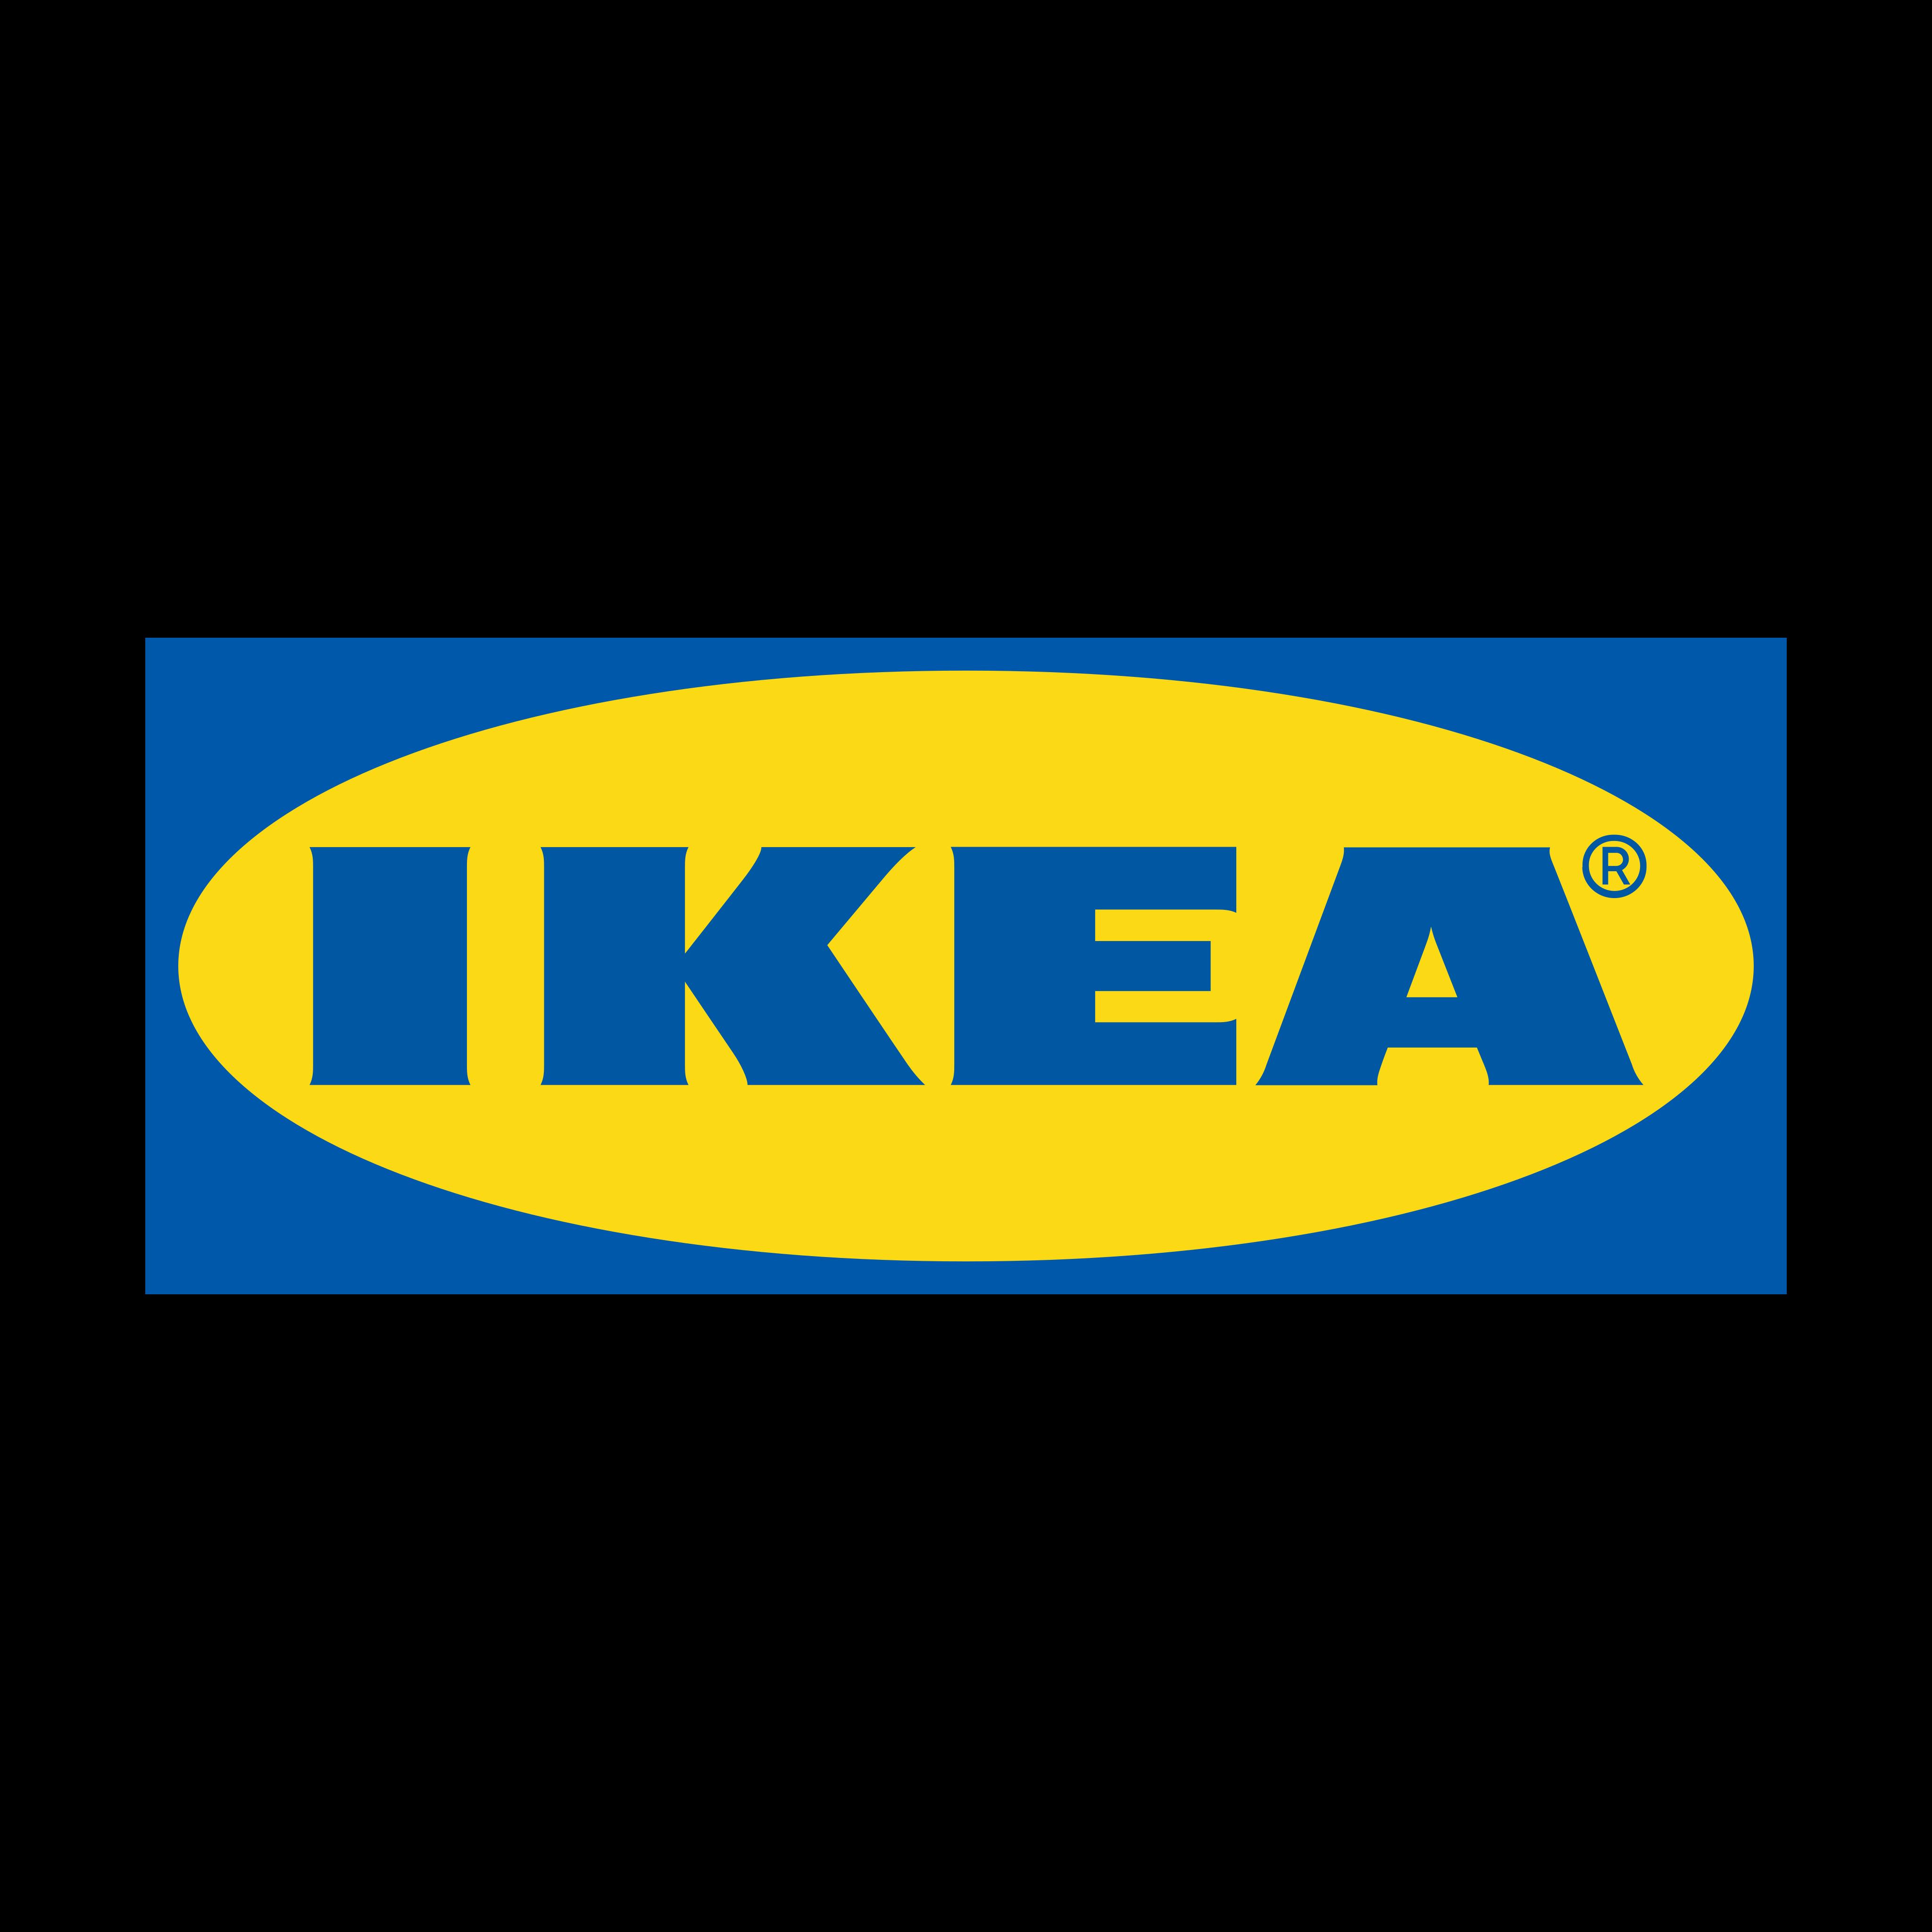 ikea logo 0 - IKEA Logo